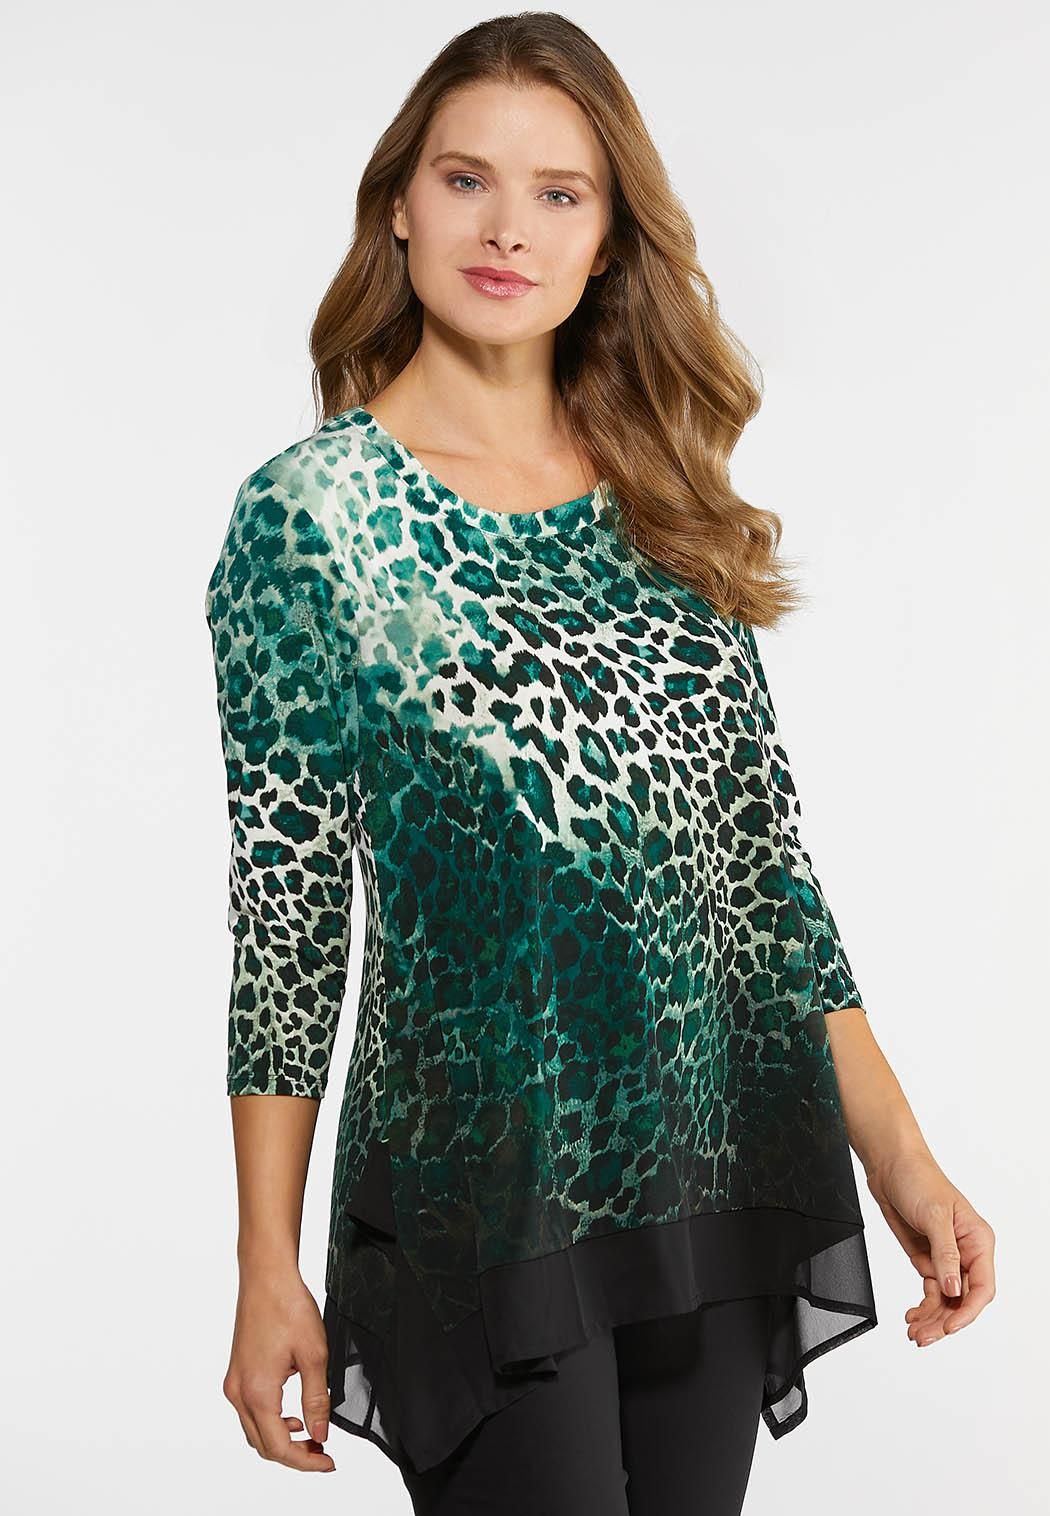 Green Leopard Print Top